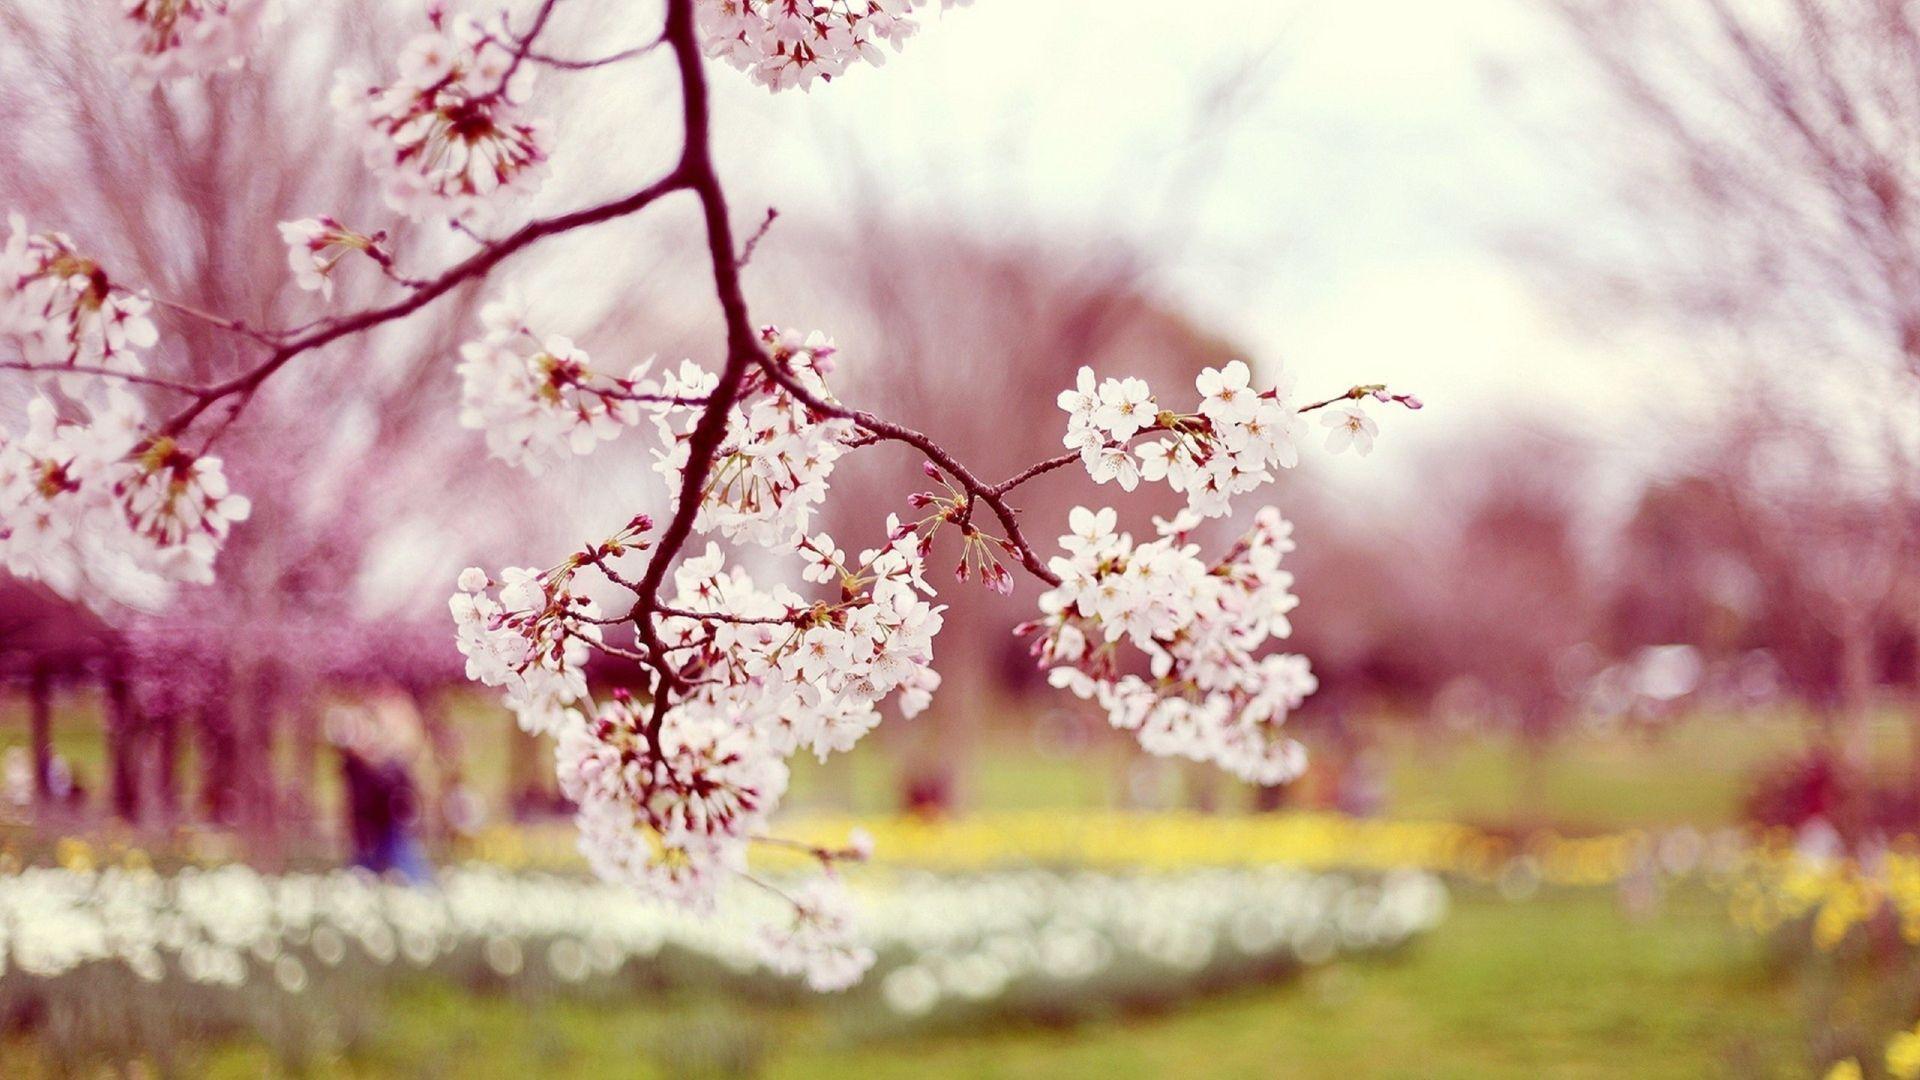 Sakura flower wallpaper images all free download